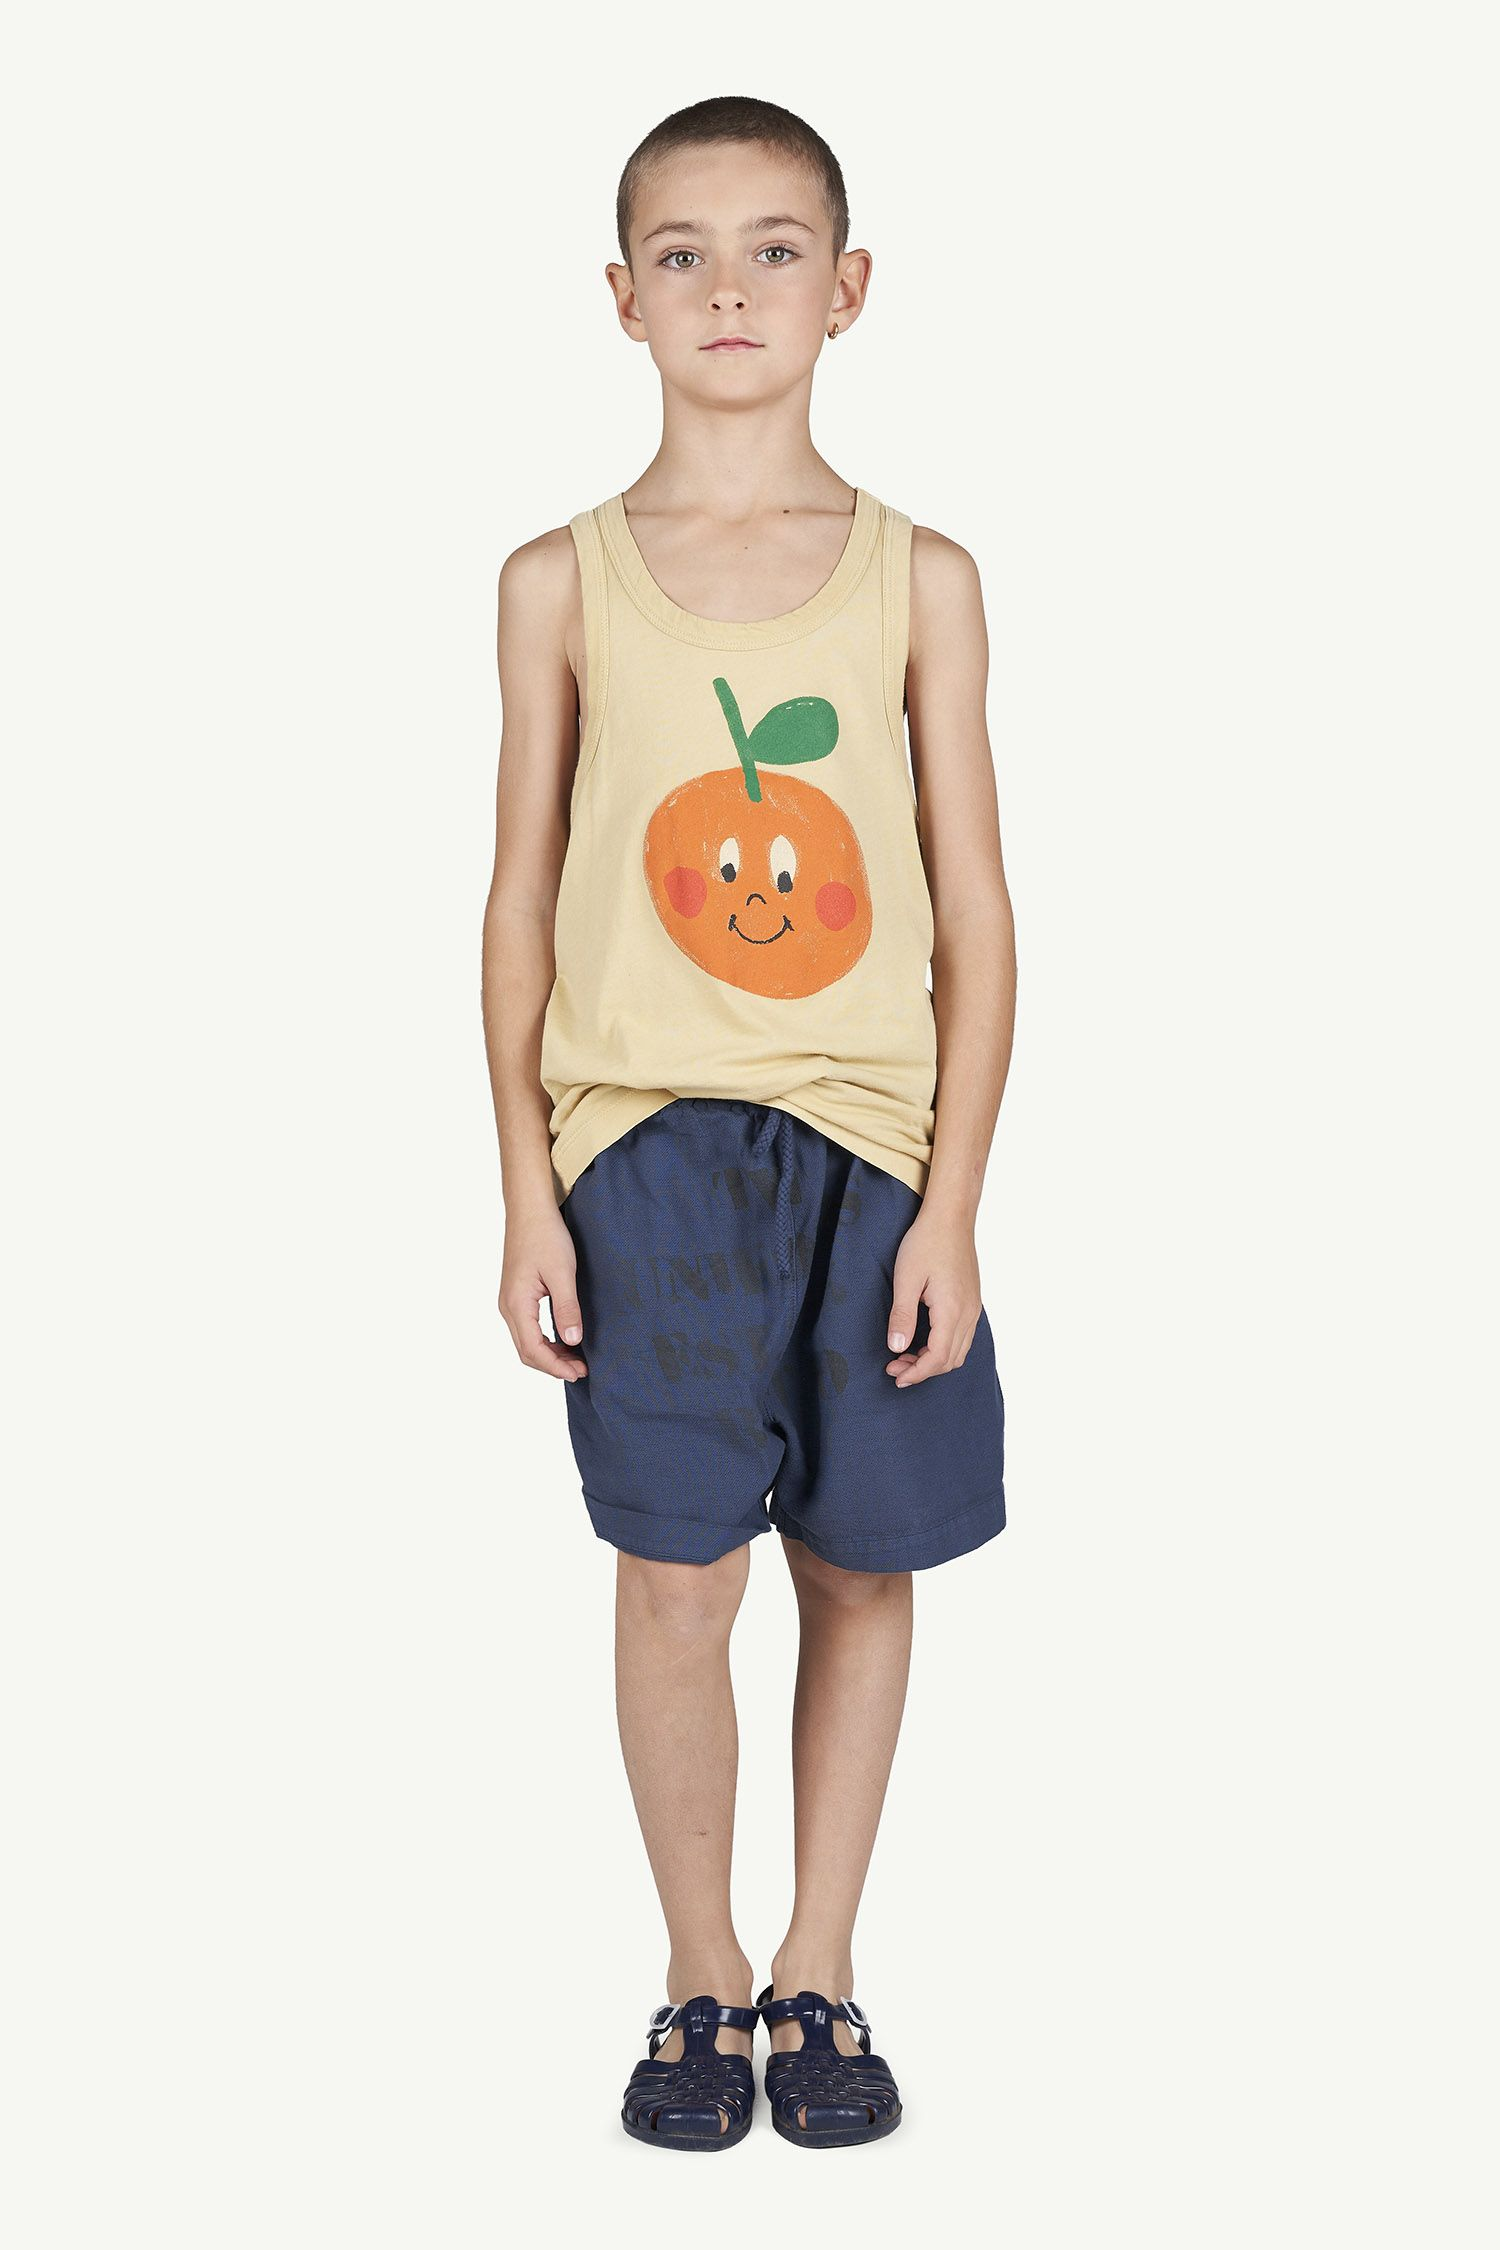 Kids T Shirts 2021 TAO Brand New Spring Summer Girls Boys Cartoon Print T Shirts Baby Children Cotton Fashion Tops Tees Clothes 5